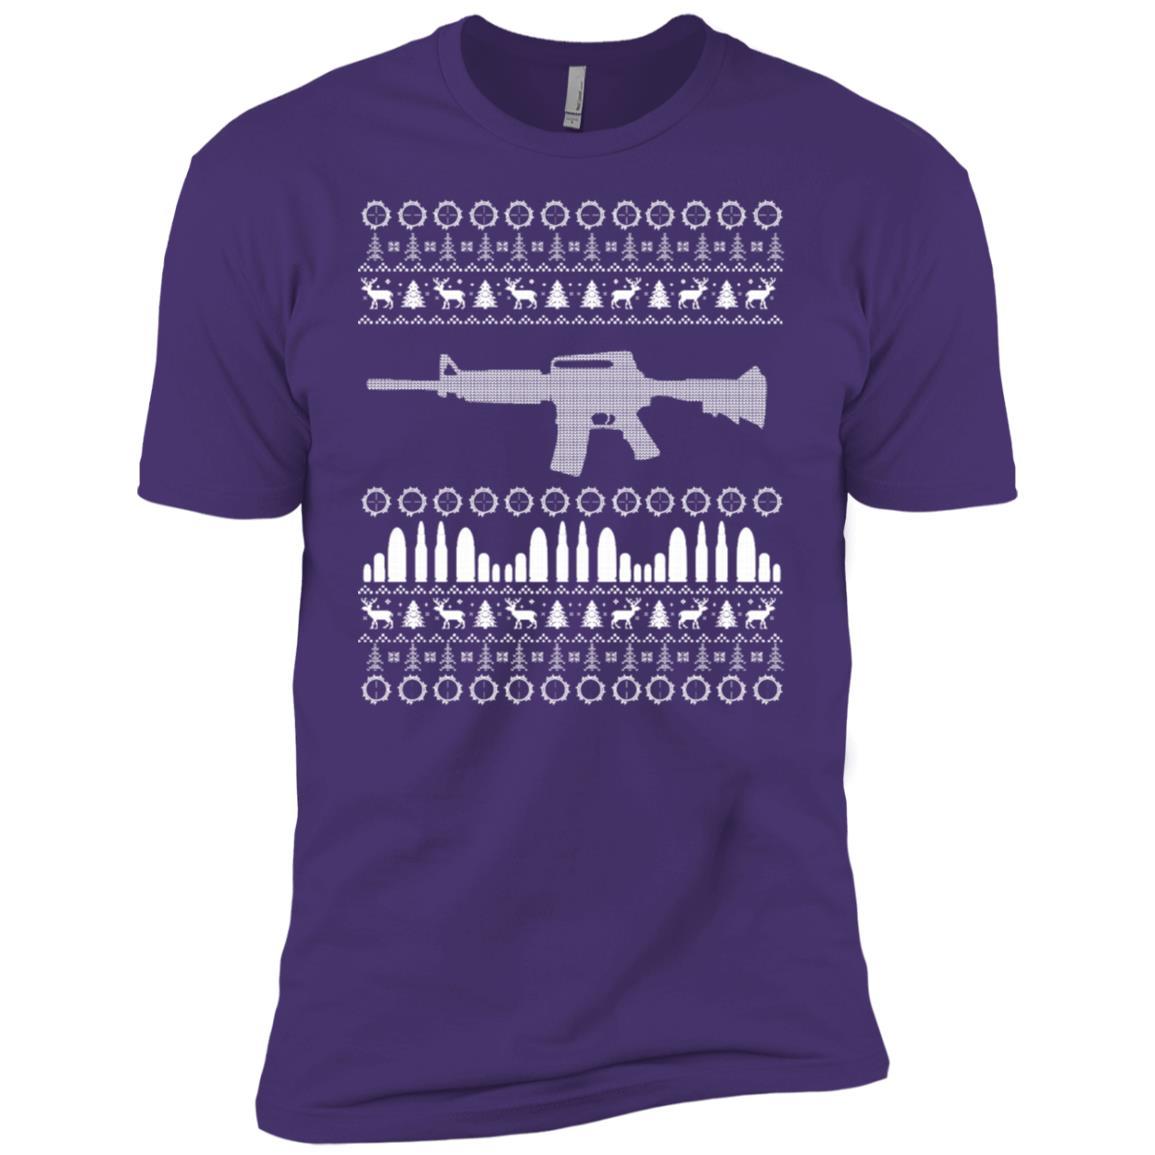 Ar-15 Machine Gun Ugly Christmas Sweater Ls Tee White Print Men Short Sleeve T-Shirt